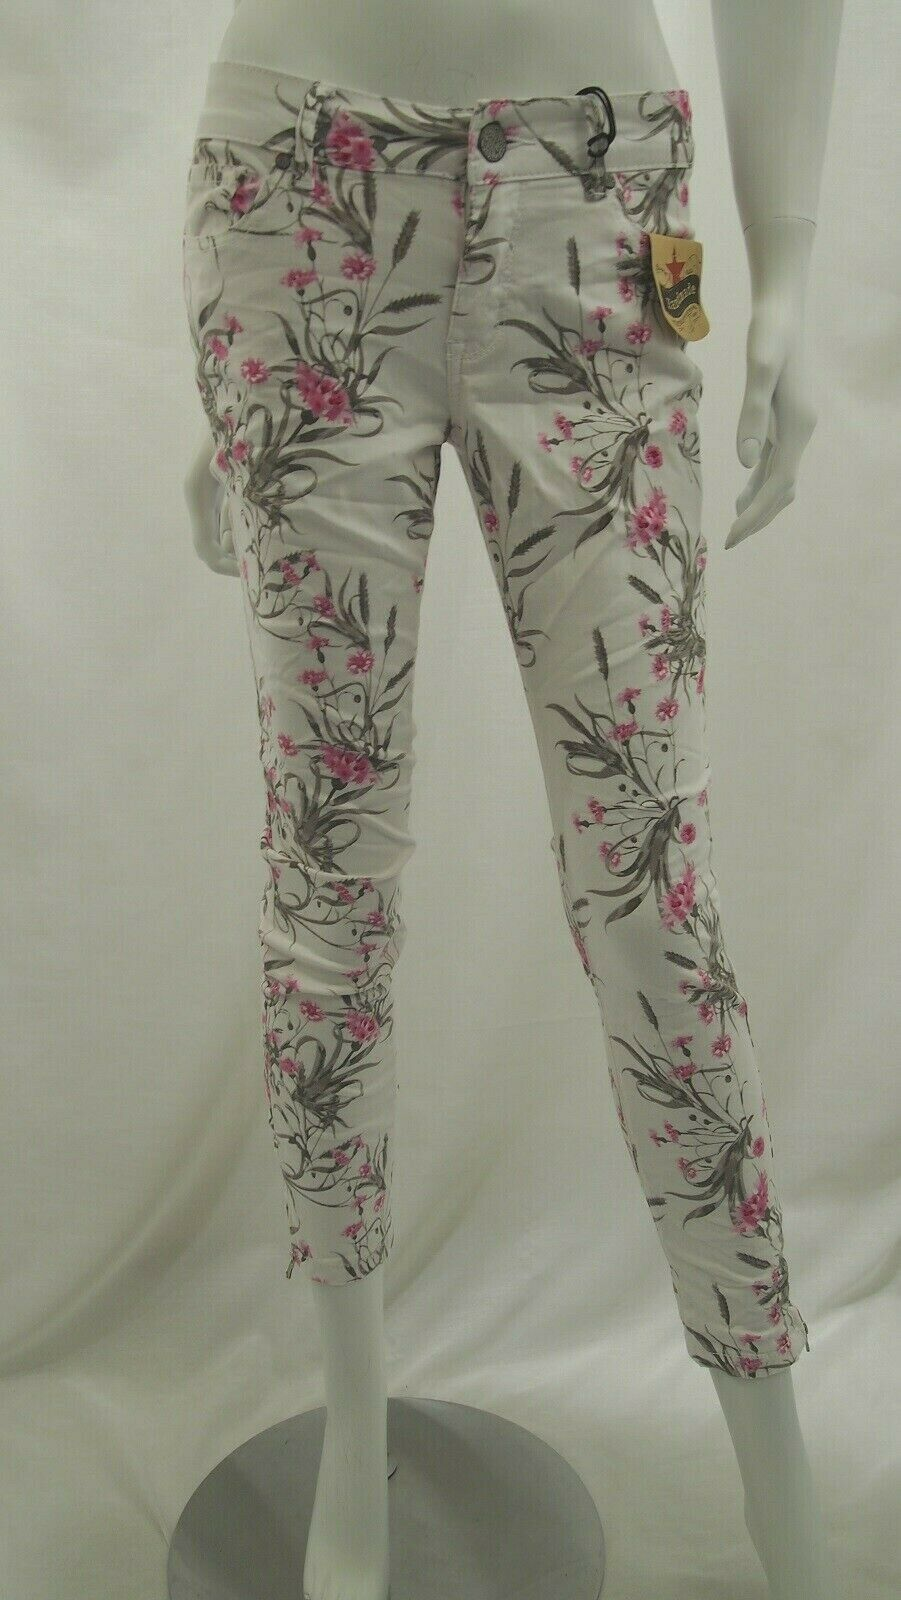 Buena VISTA ITALY 7 8 Stretch Twill Pantaloni Jeans 1903 j5281 502 blumenprint NUOVO